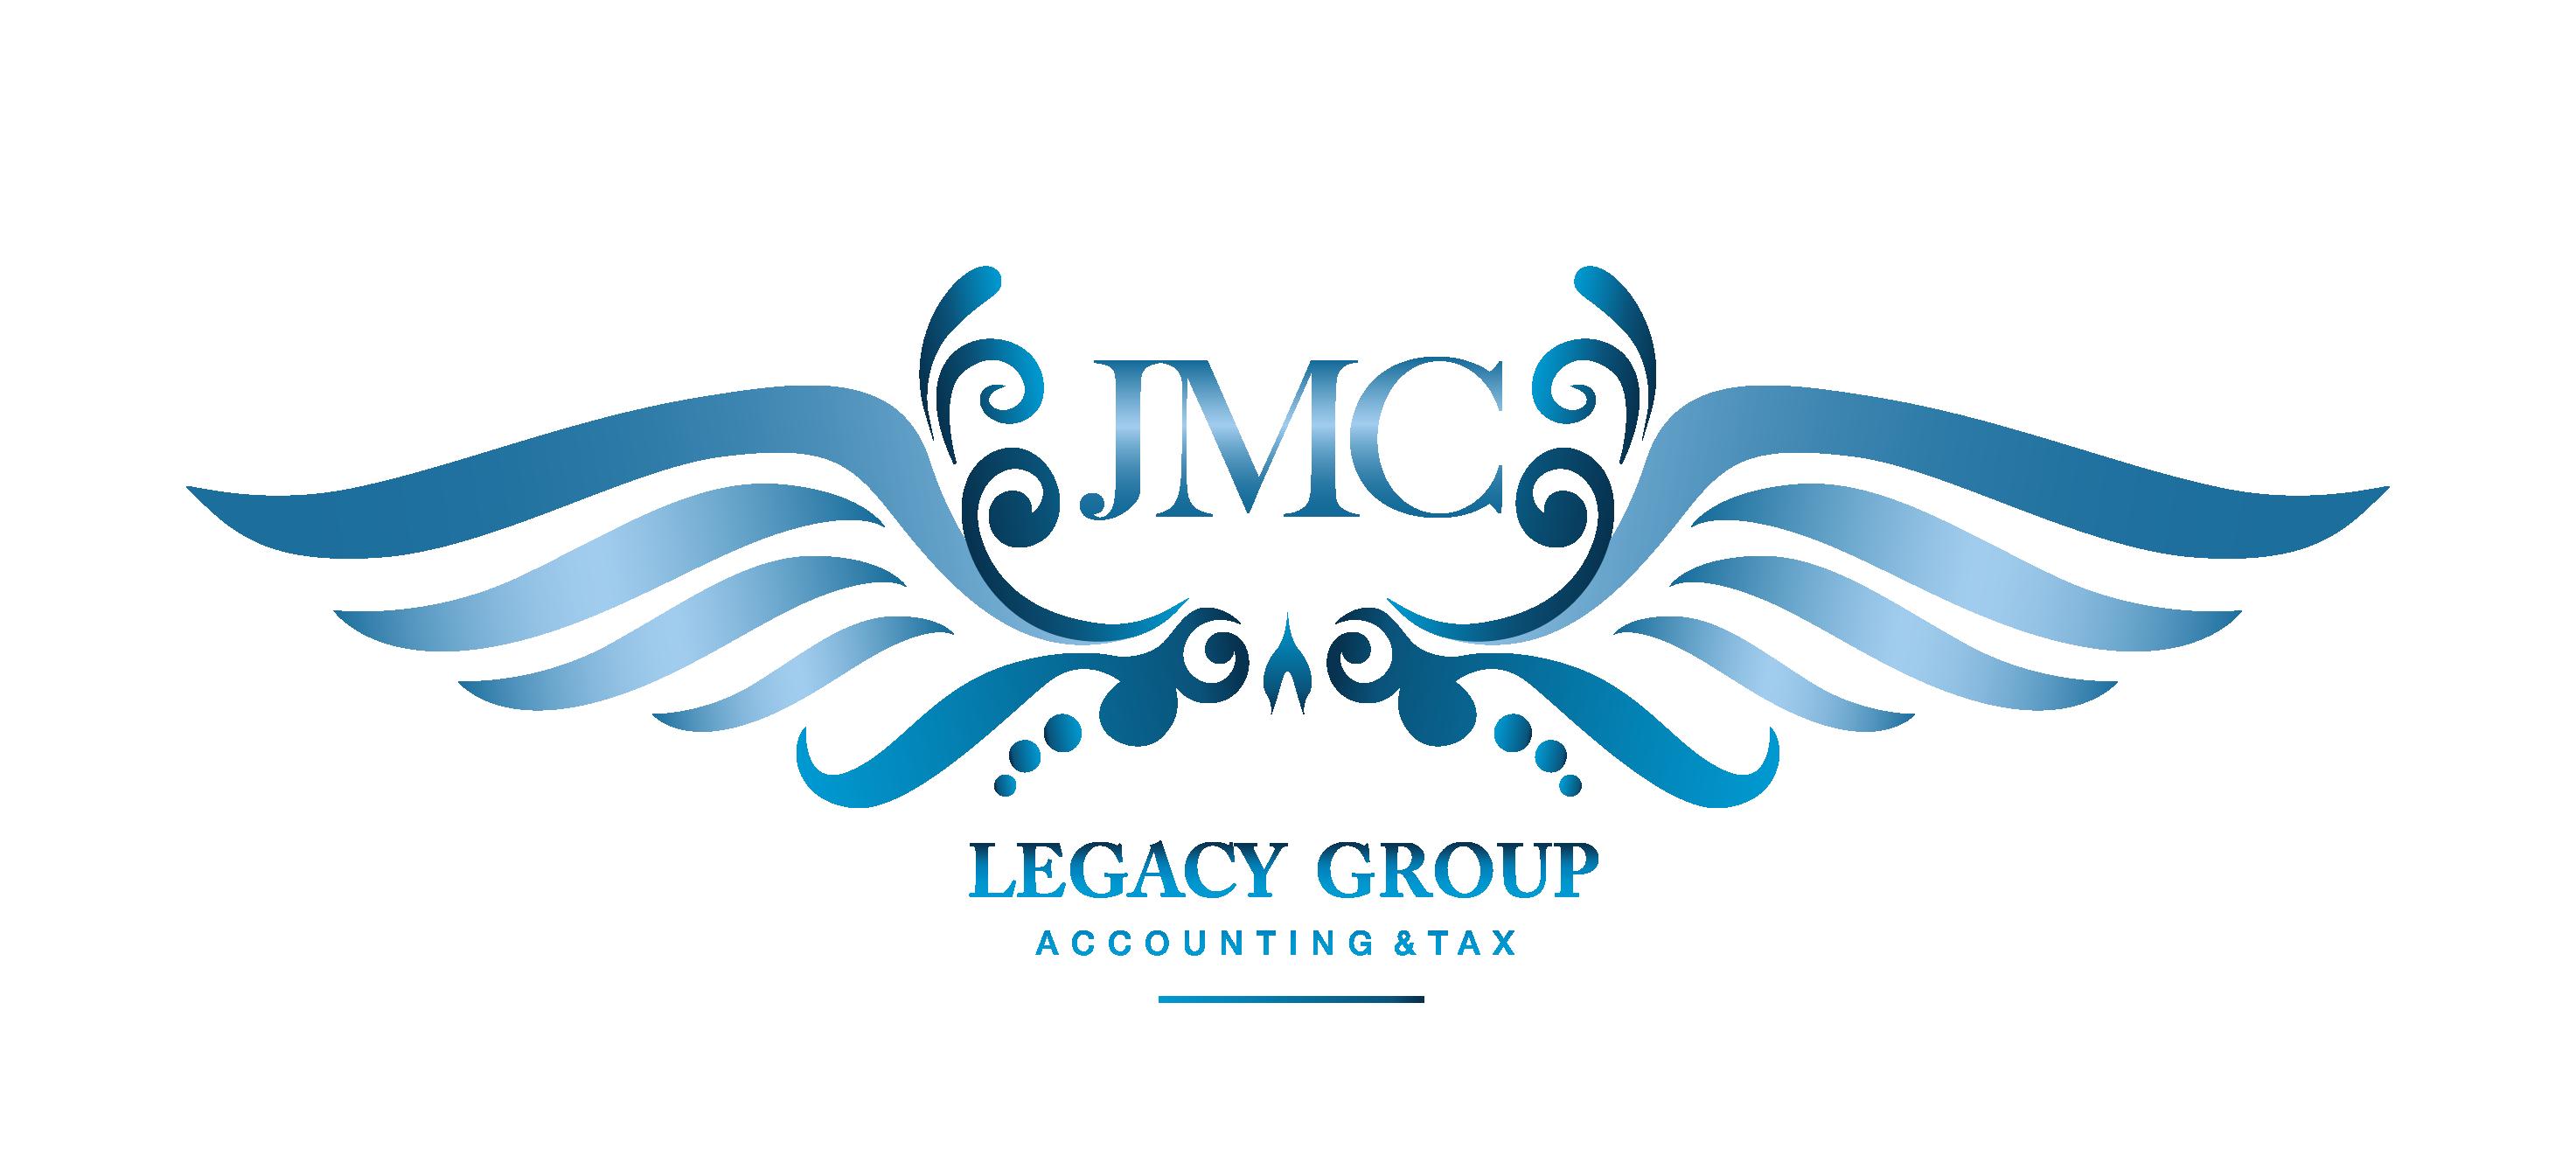 The Bristish Open - JMC Legacy Group - Logo